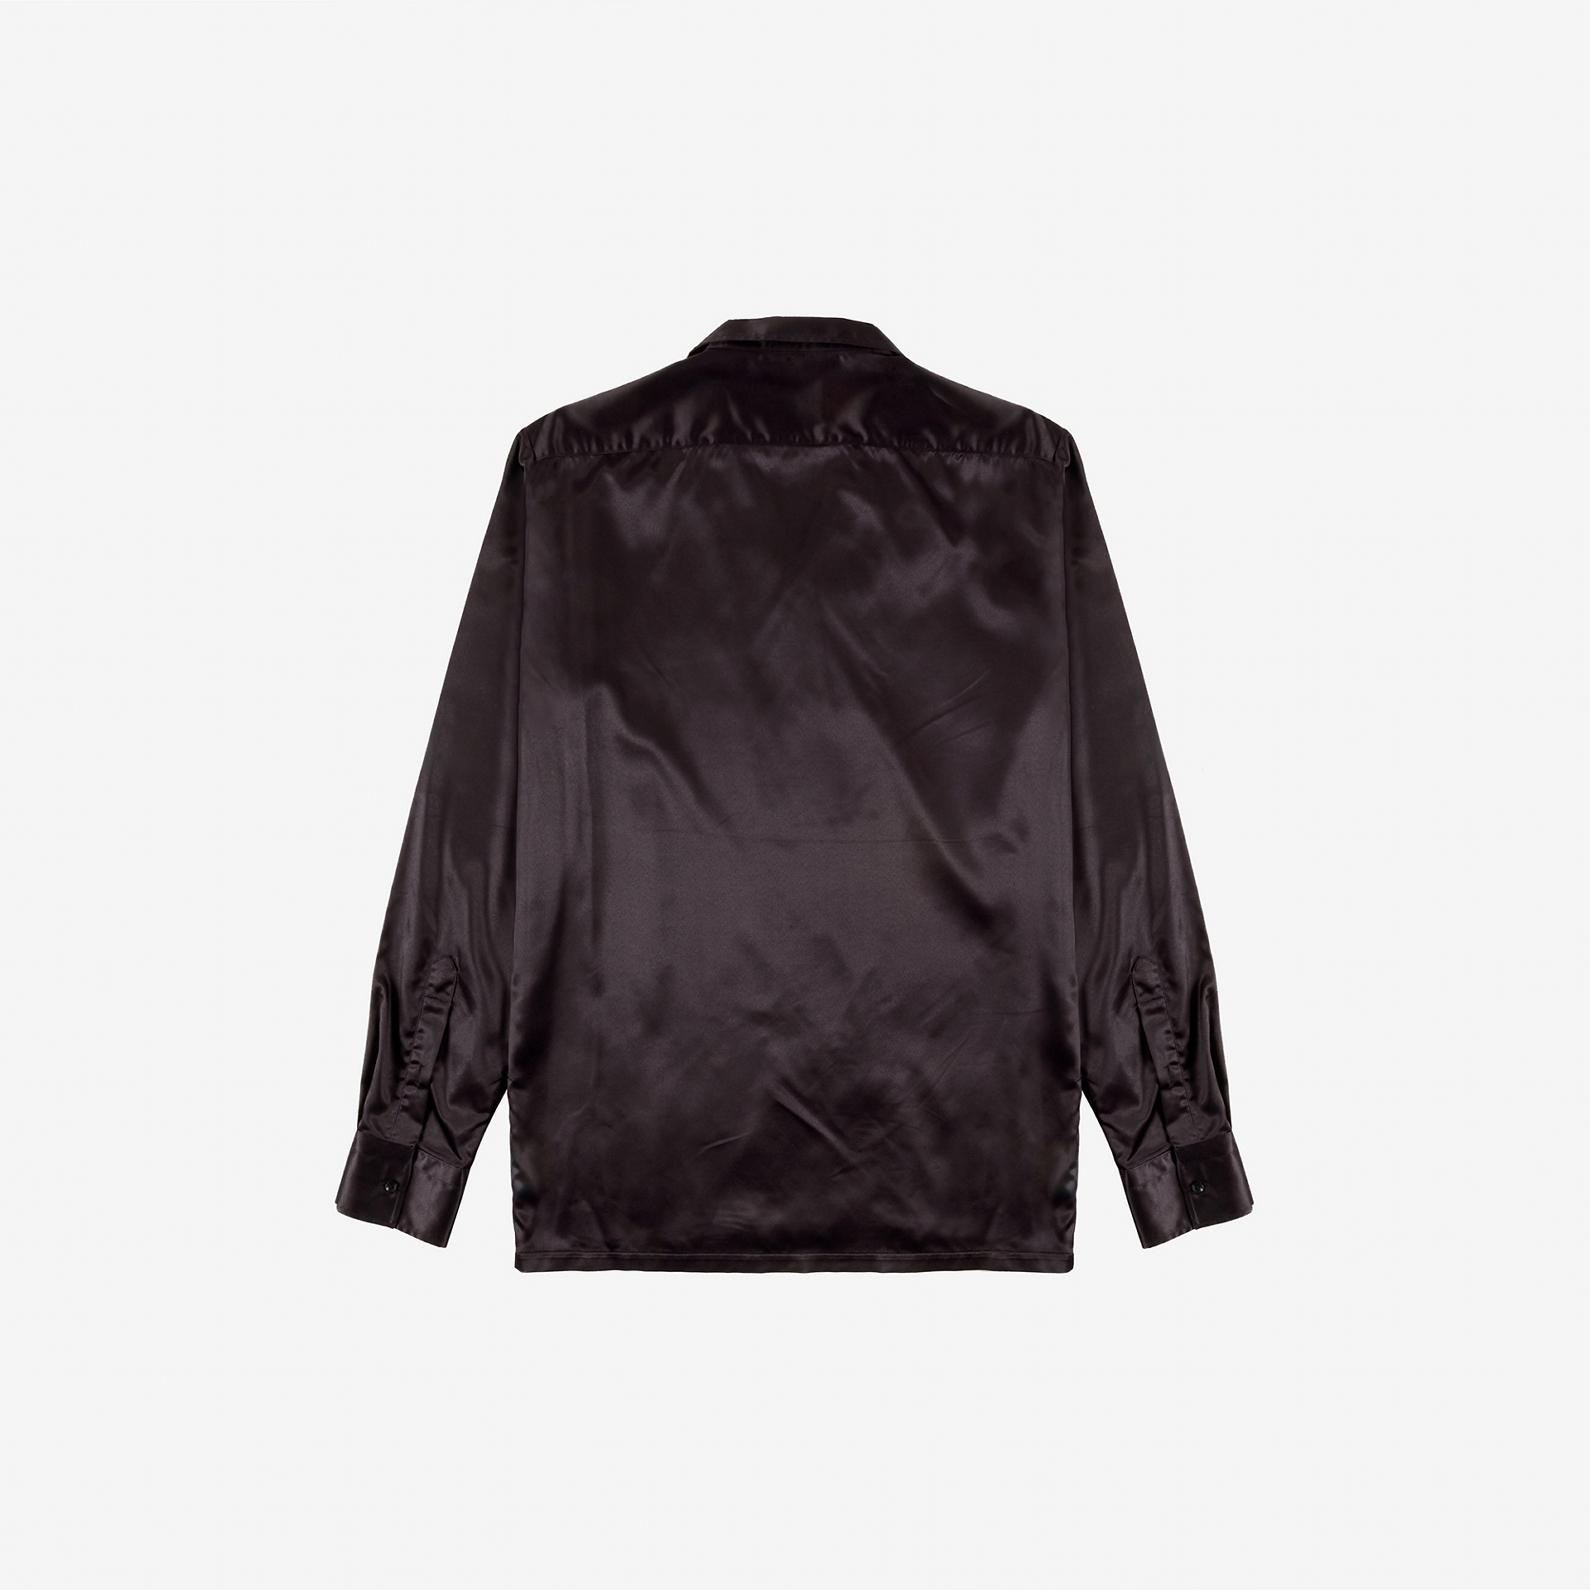 【PAS DE MER/パドゥメ】GRAFFITI SHIRT 長袖シャツ / BLACK